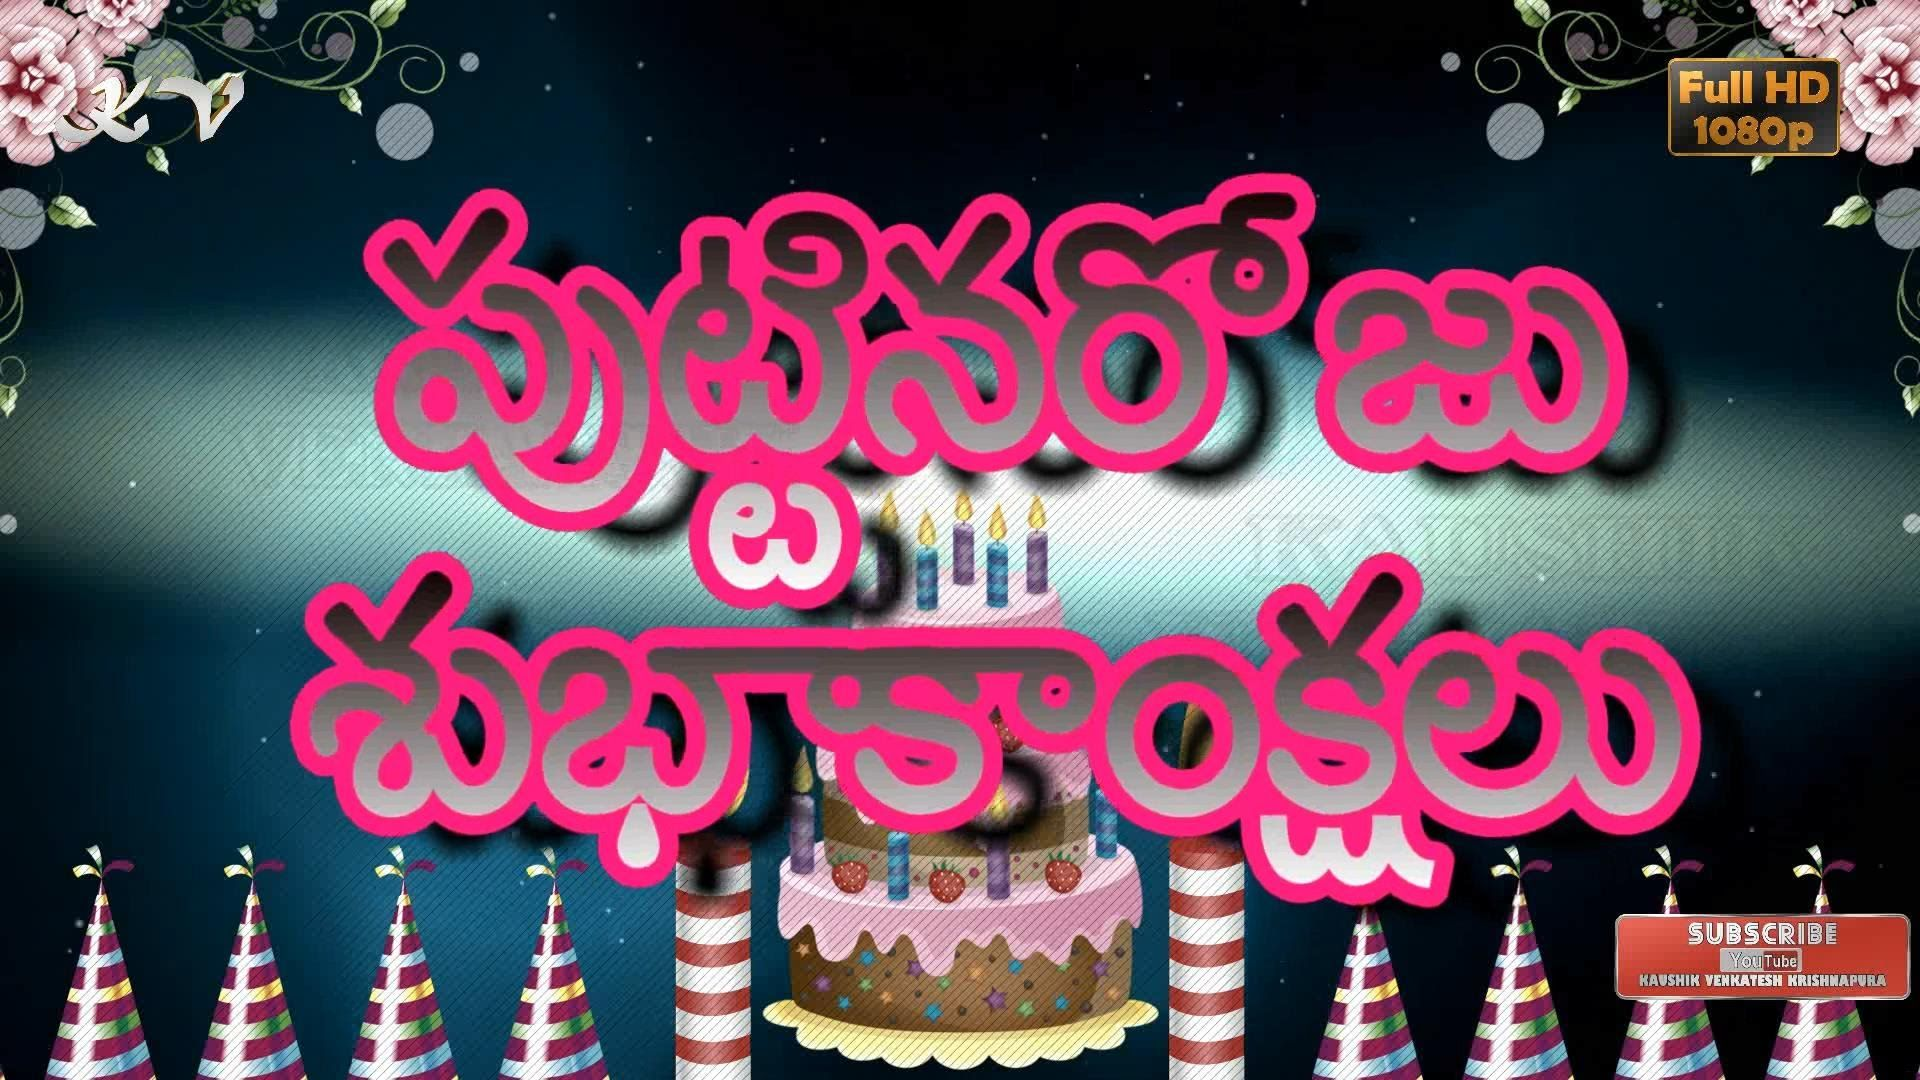 Telugu Birthday Video Greetings Happy Birthday Wishes In Telugu